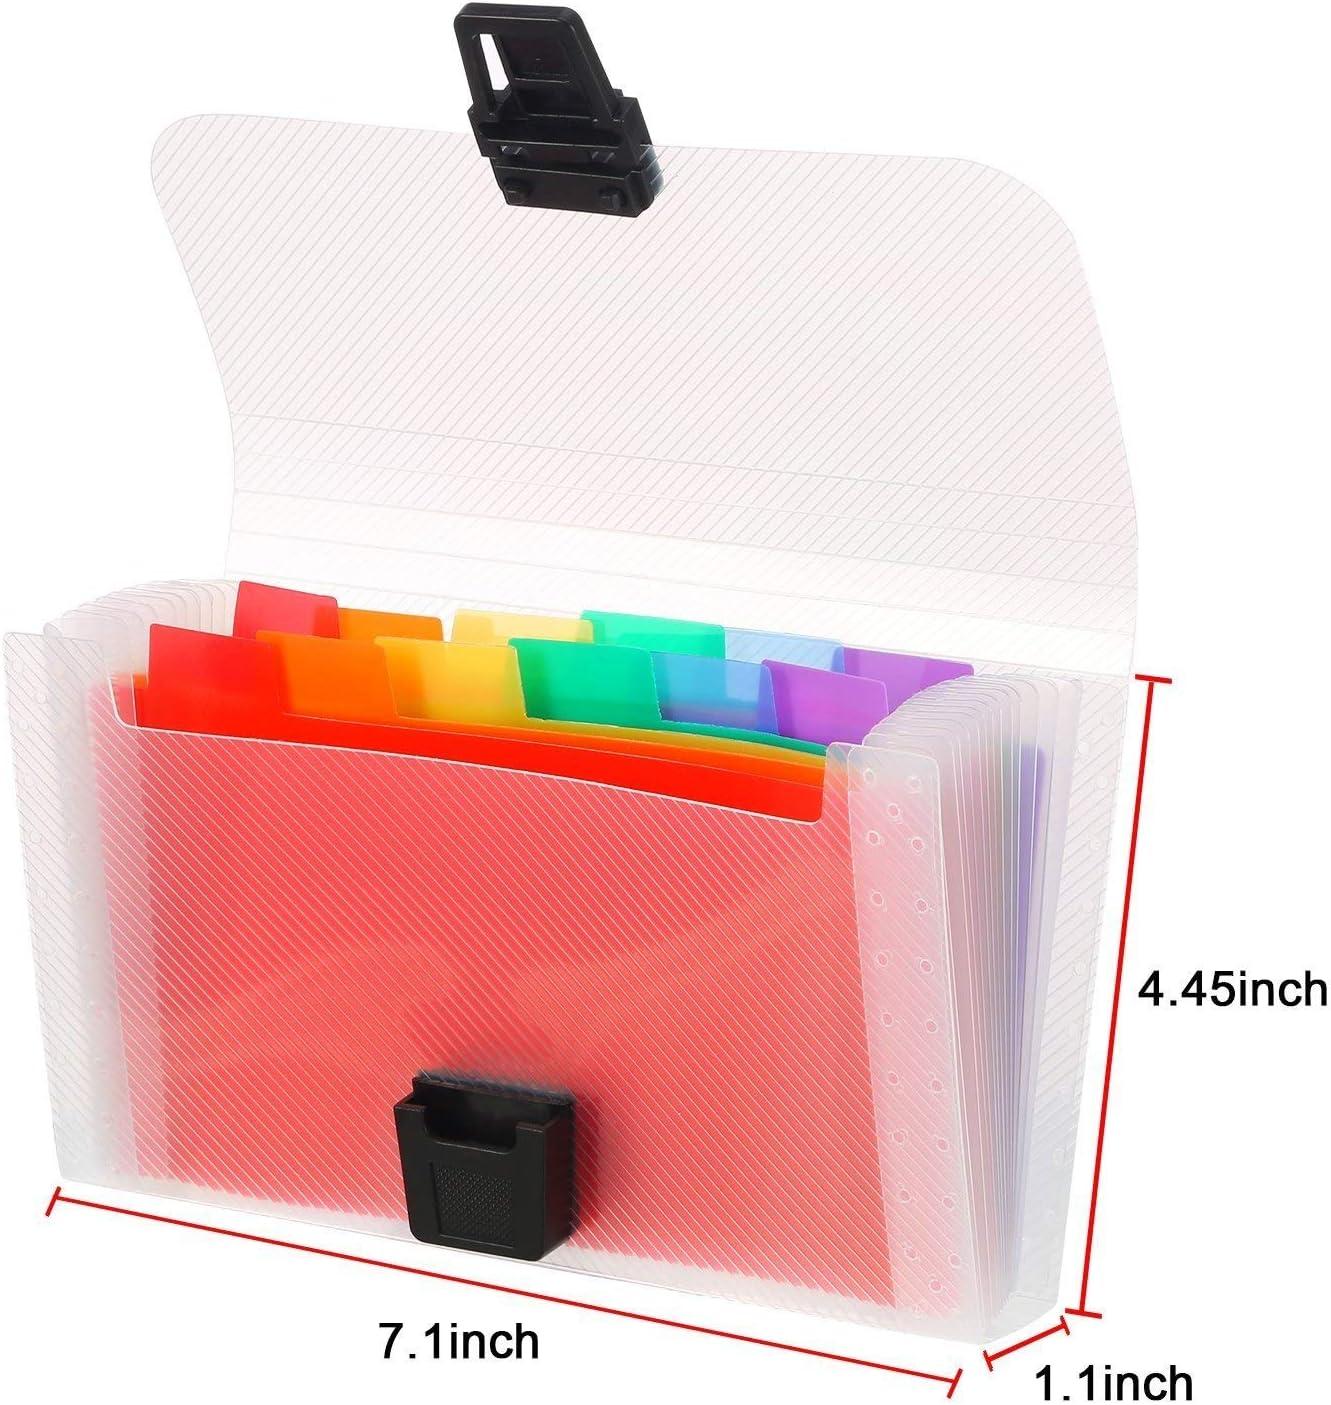 Details about  /Office Supplies A6 Expanding File Folder Organizer Document Wallet Bag 13 LYJUHL